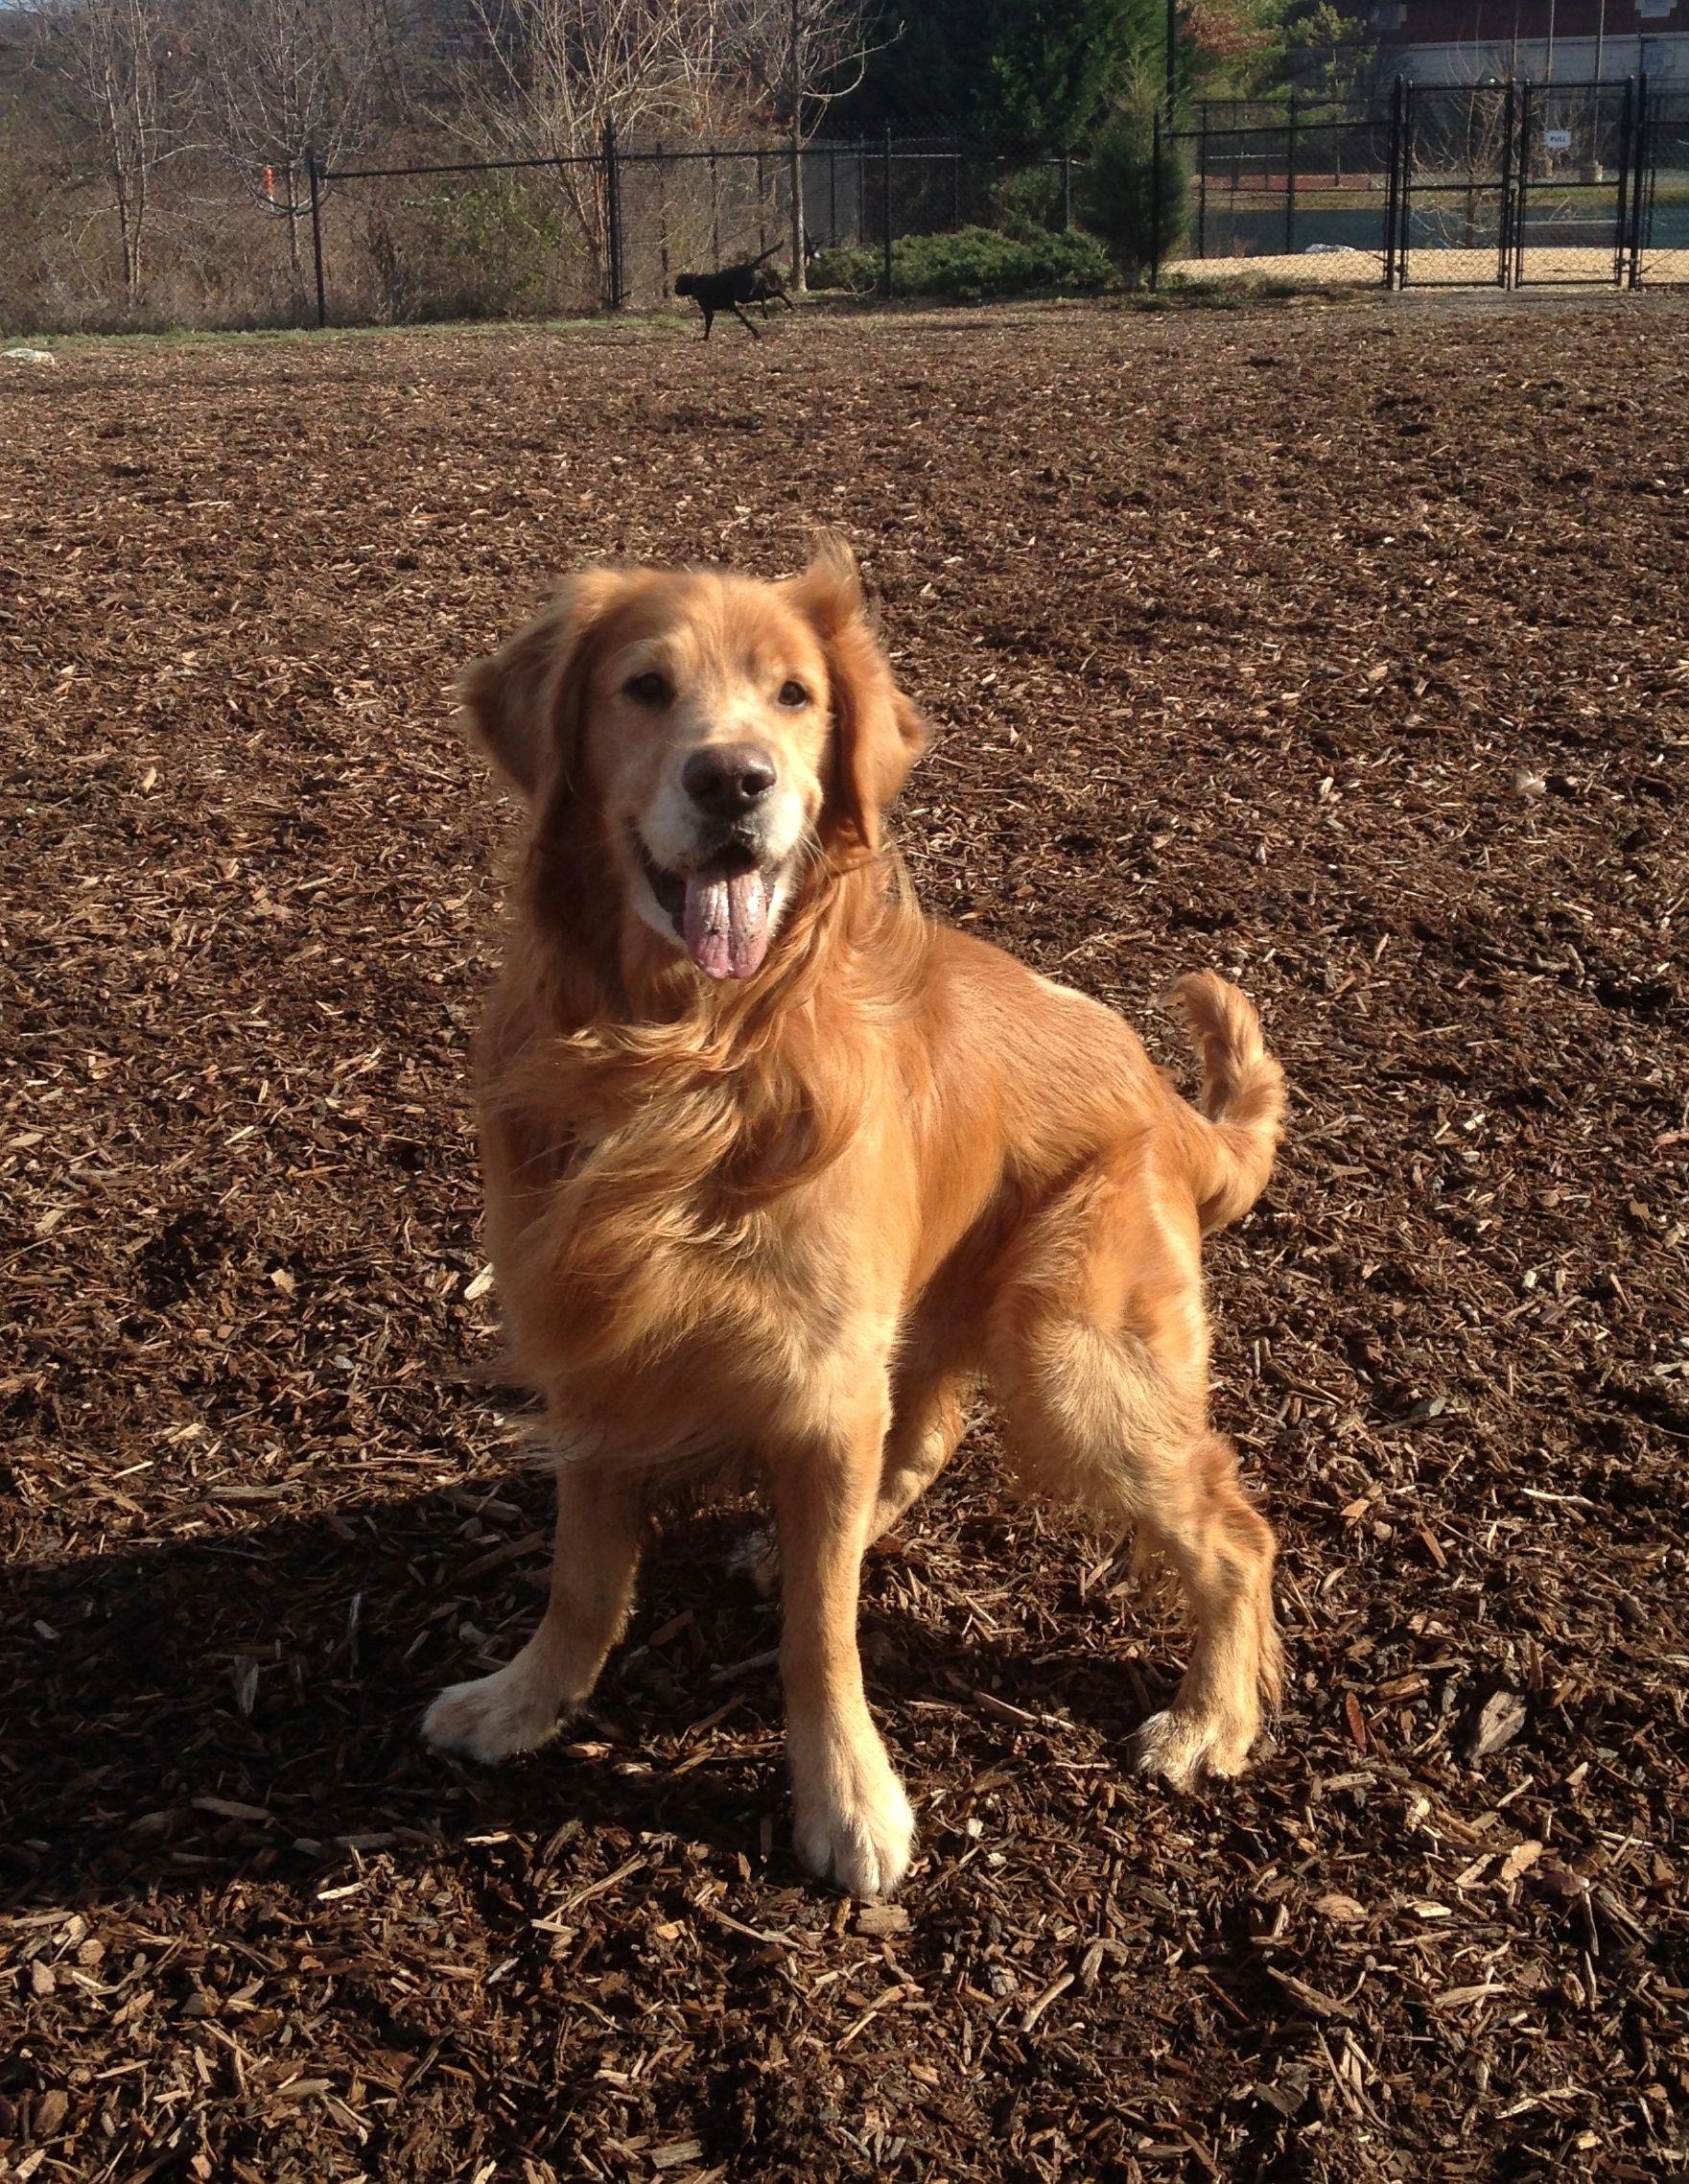 Pin By Wanda Davis On I Love Golden Retrievers Dogs Crate Training Dog Cat